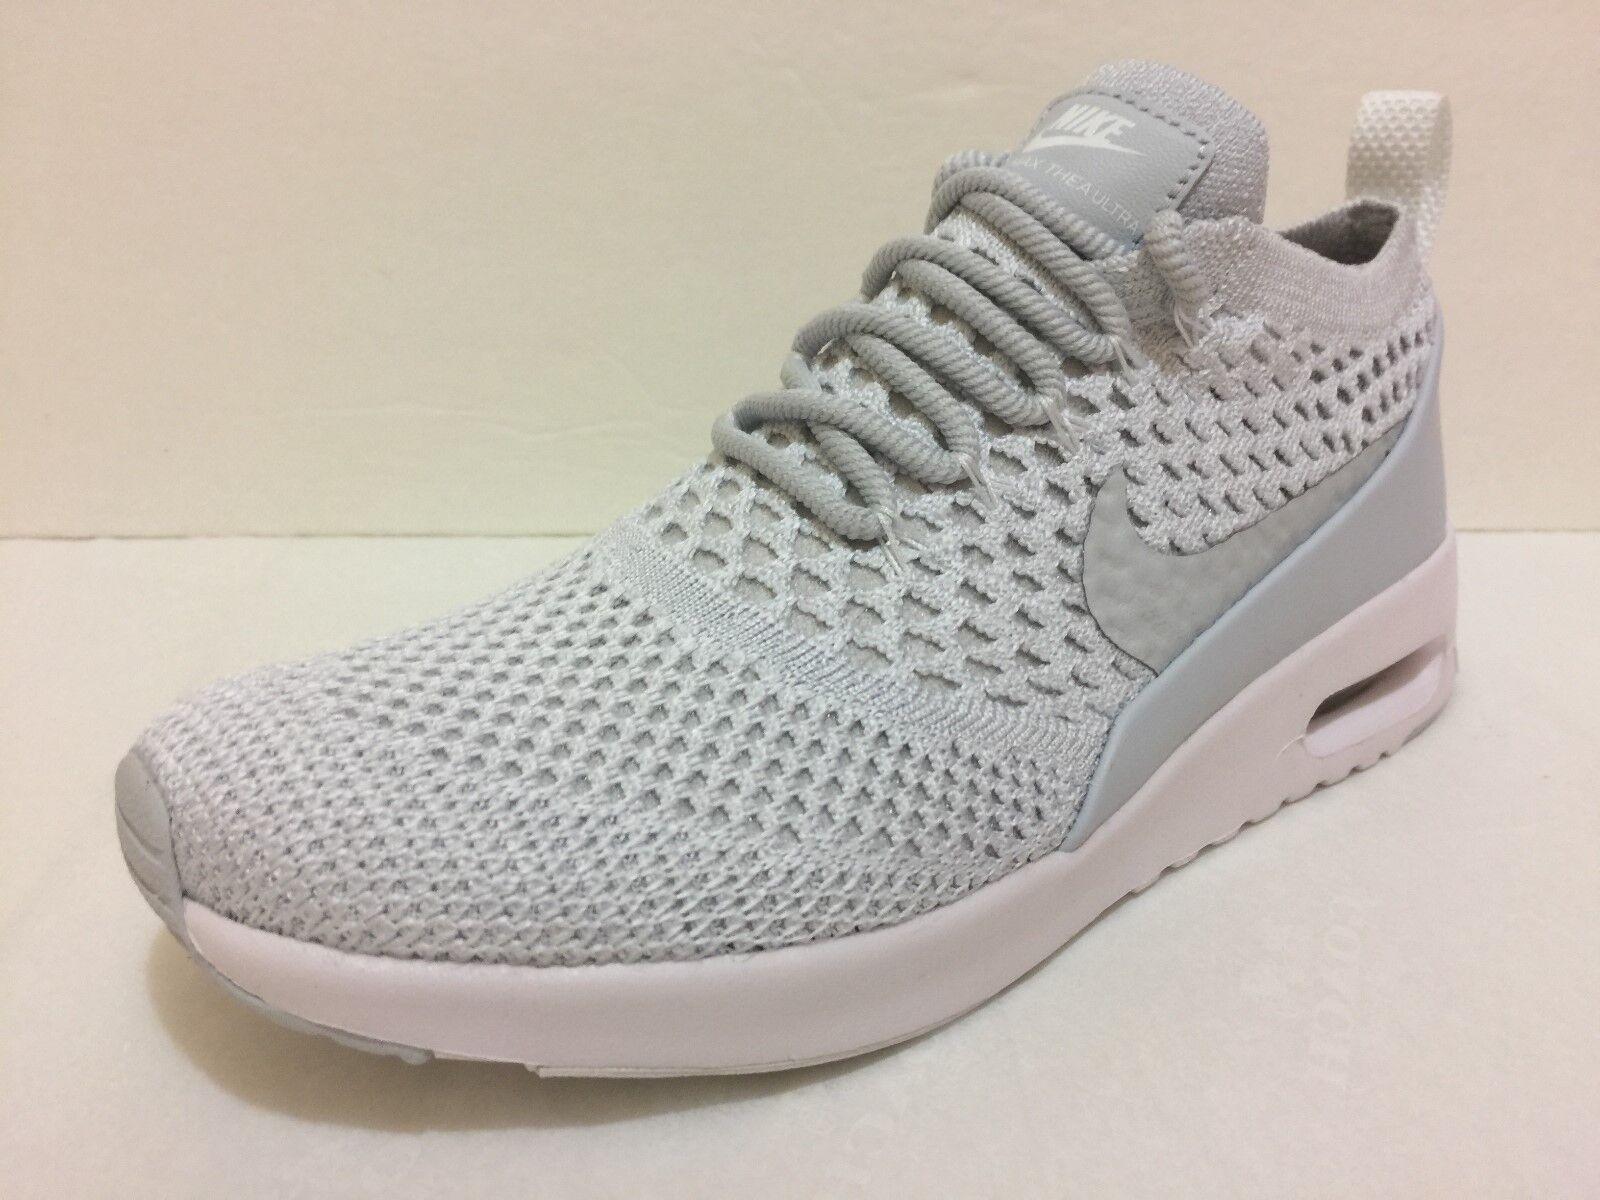 Nike Air Max Thea Ultra Flyknit Grey Womens Running Shoe 881175-002 Multi Sizes